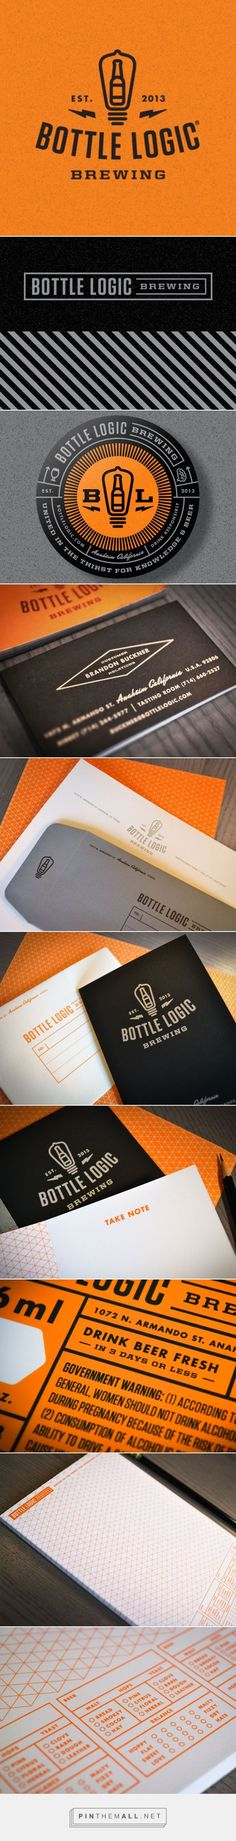 Bottle Logic Brewing Logo and Branding System